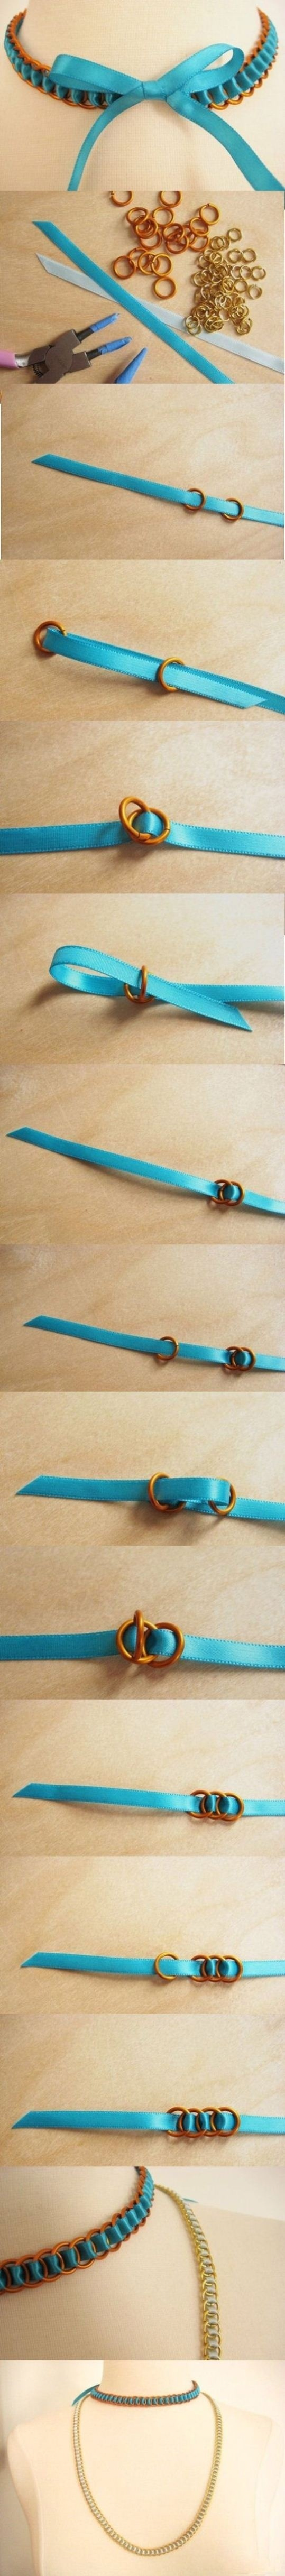 DIY Fashion Necklace   CutePinky SocialBookmarking